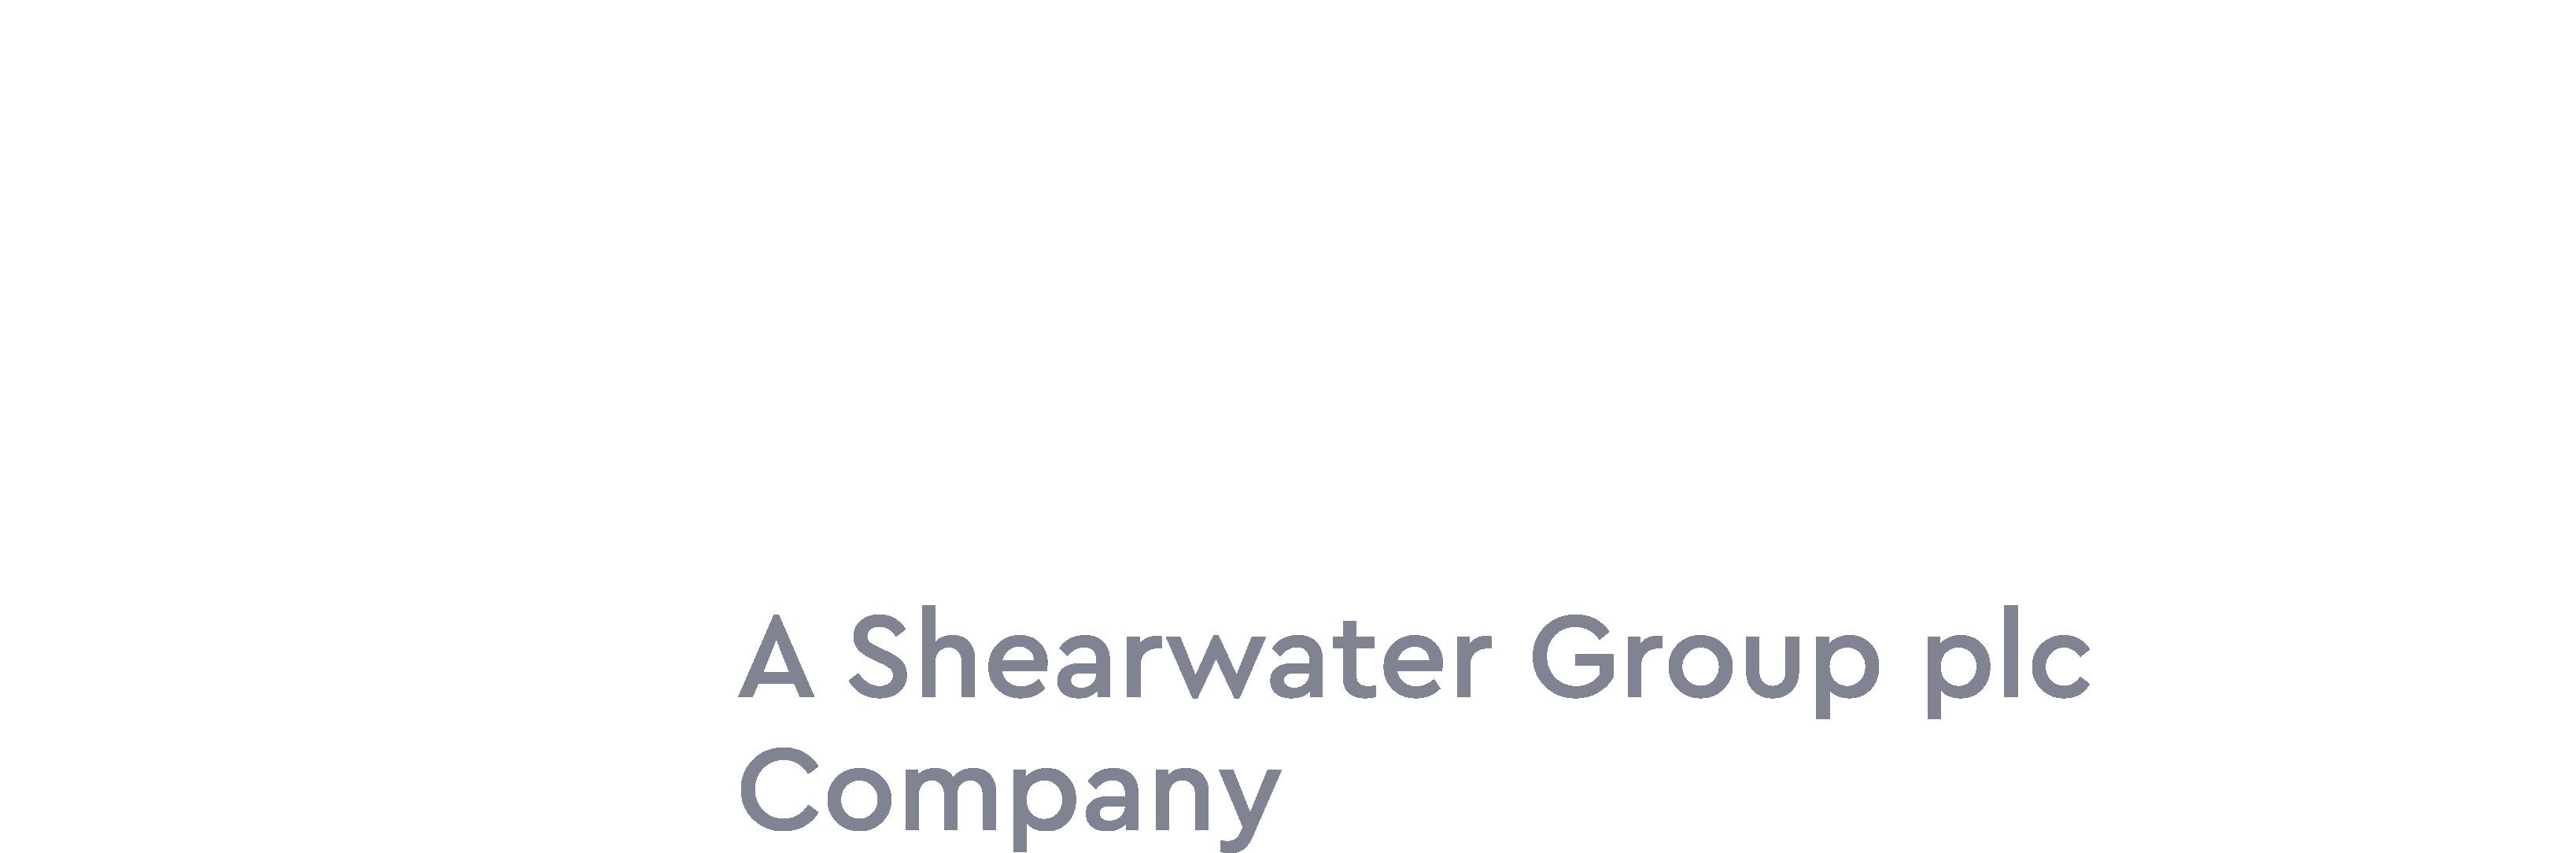 Pentest logo - Information security assurance